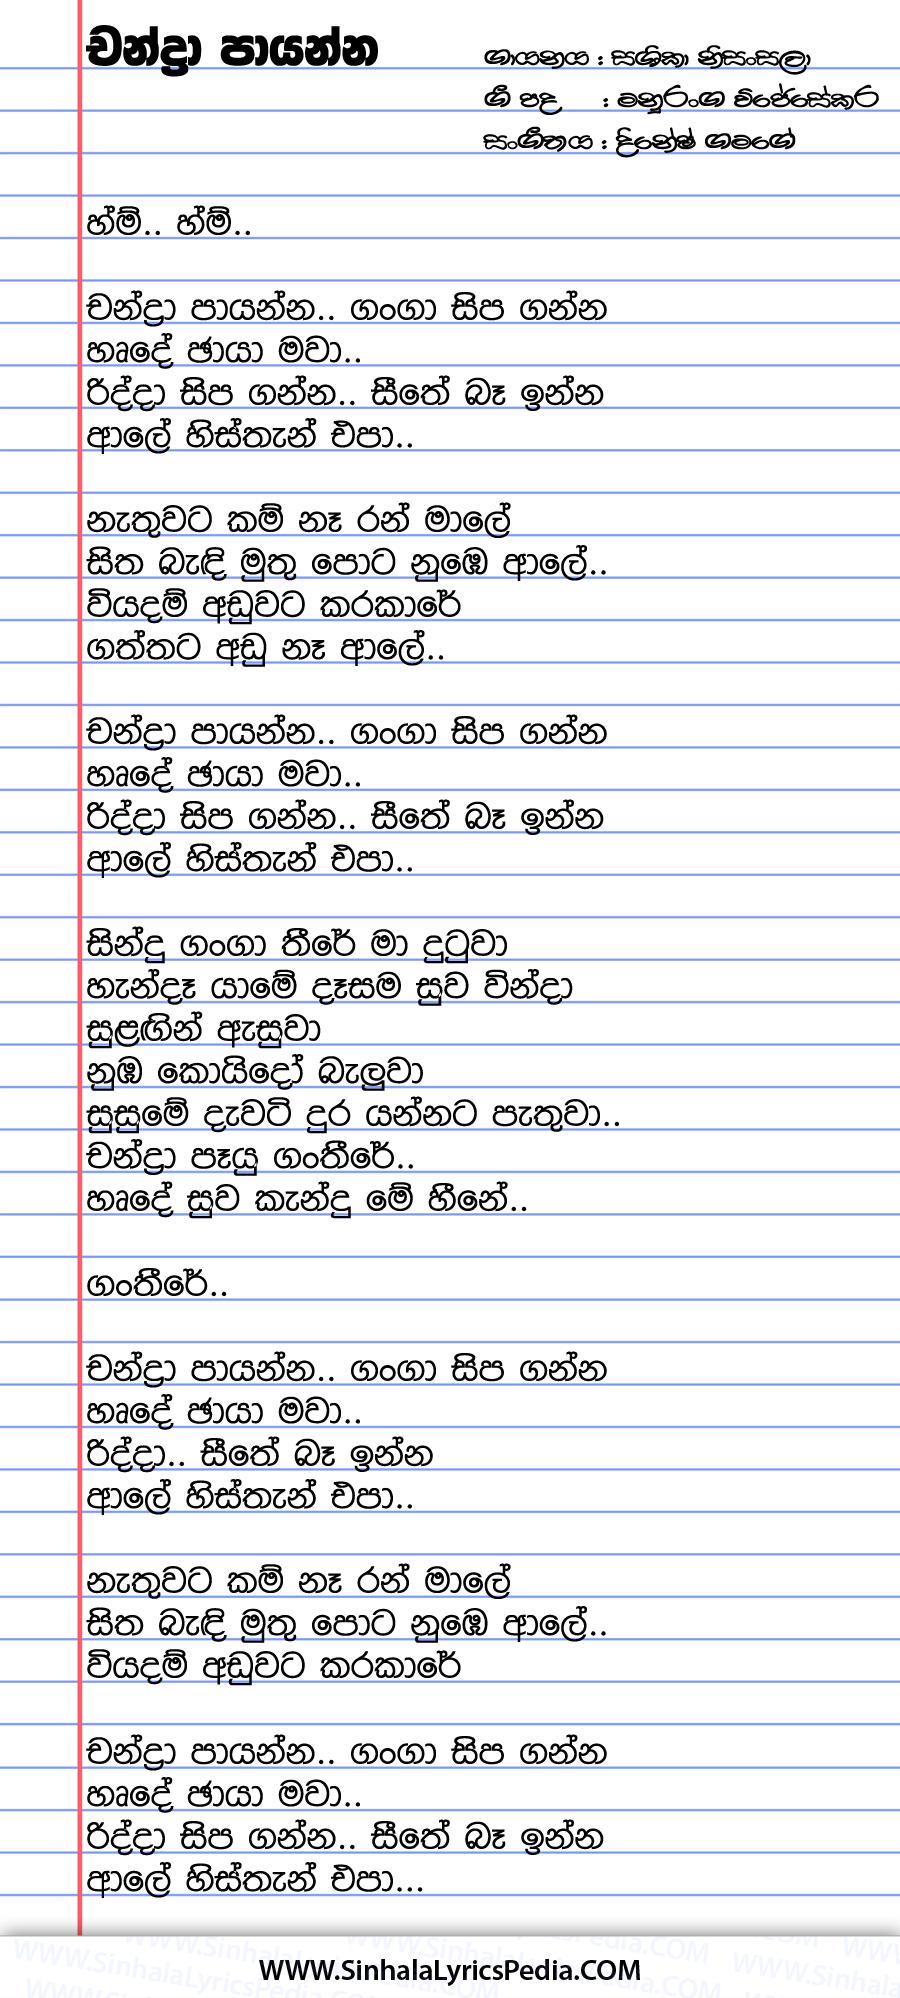 Chandra Paayanna Ganga Sipaganna Song Lyrics